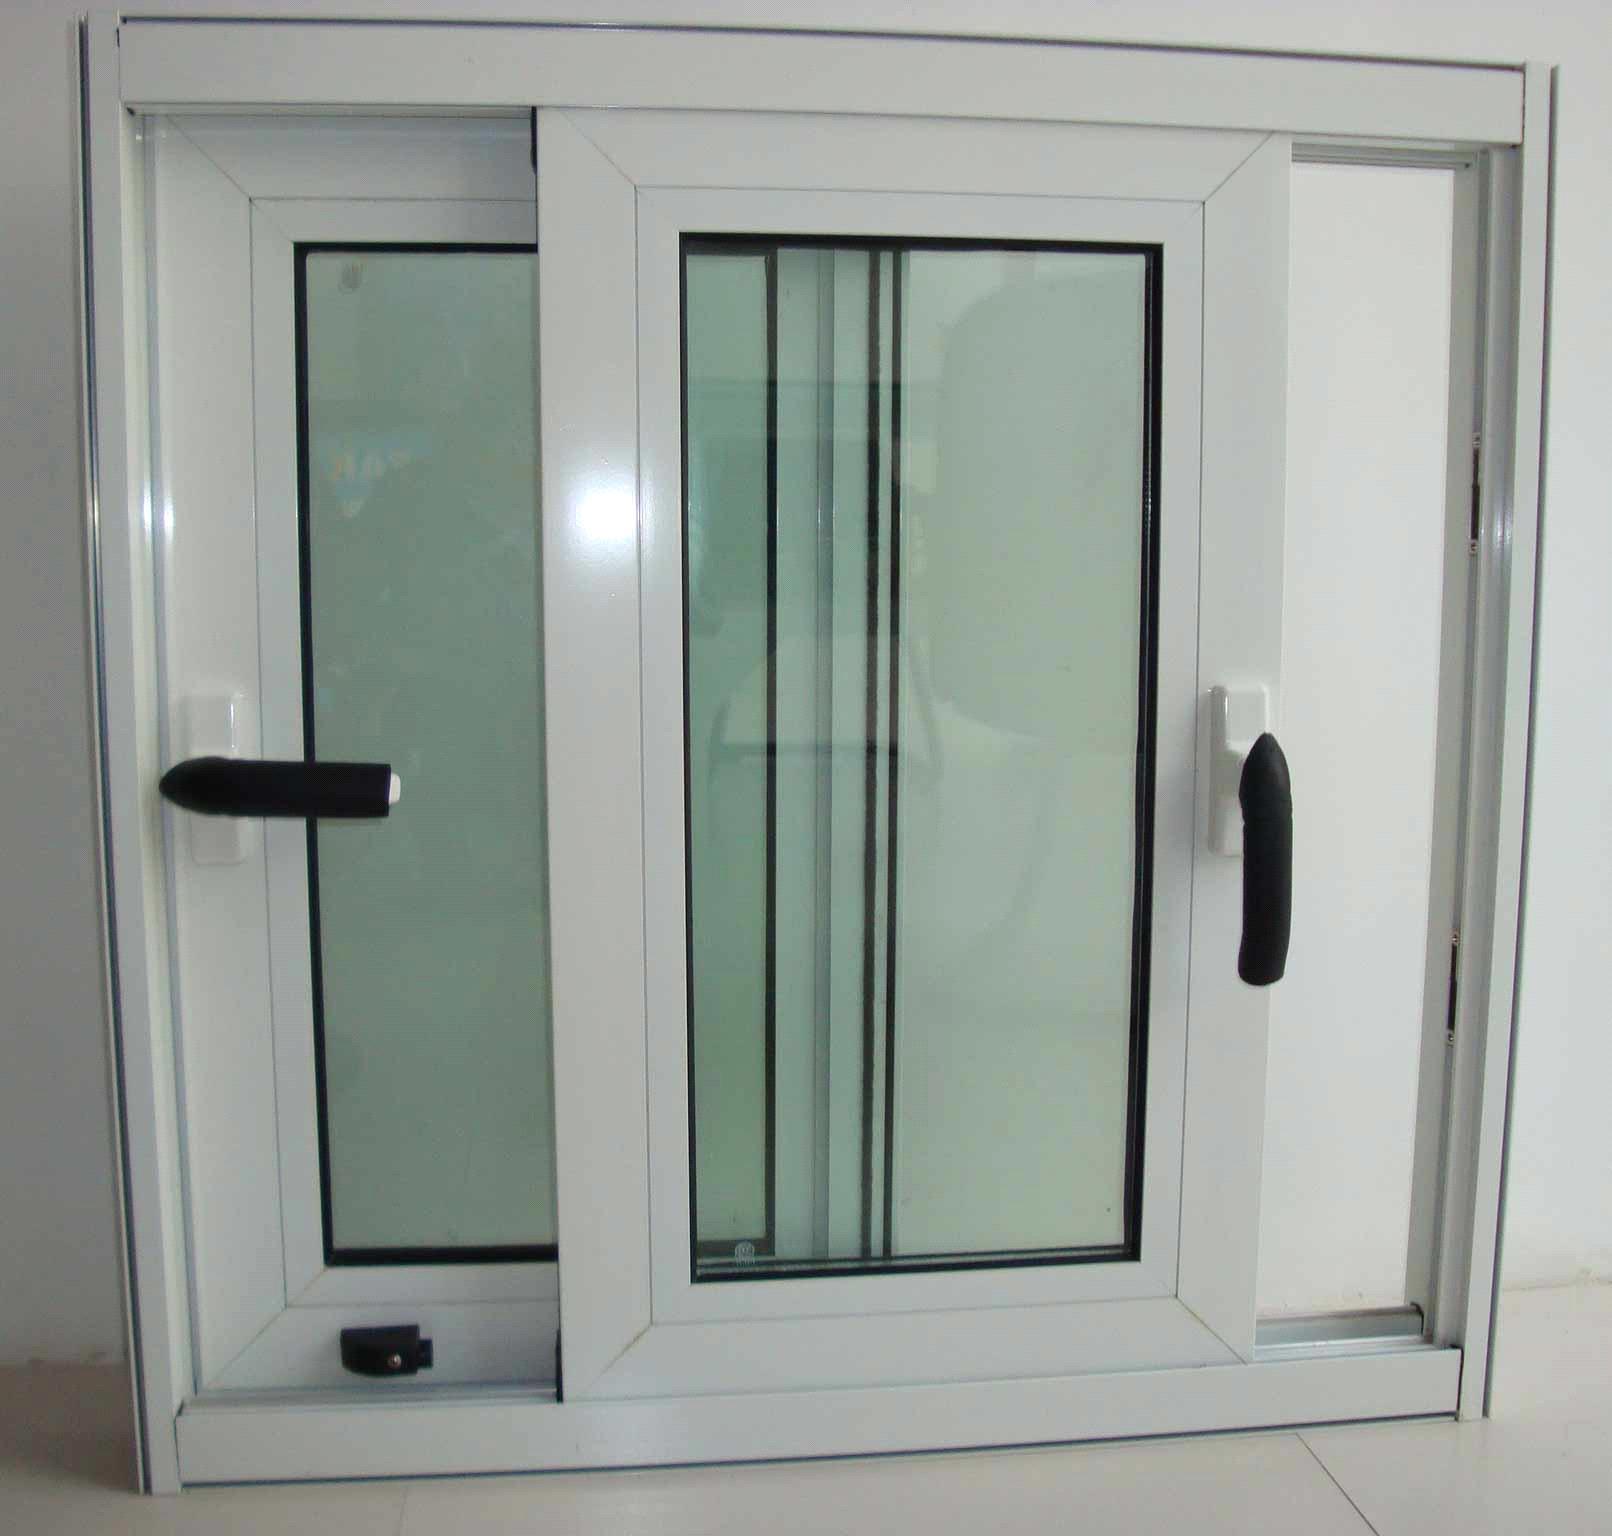 Pvc Windows And Doors : China pvc sliding window plastic parts